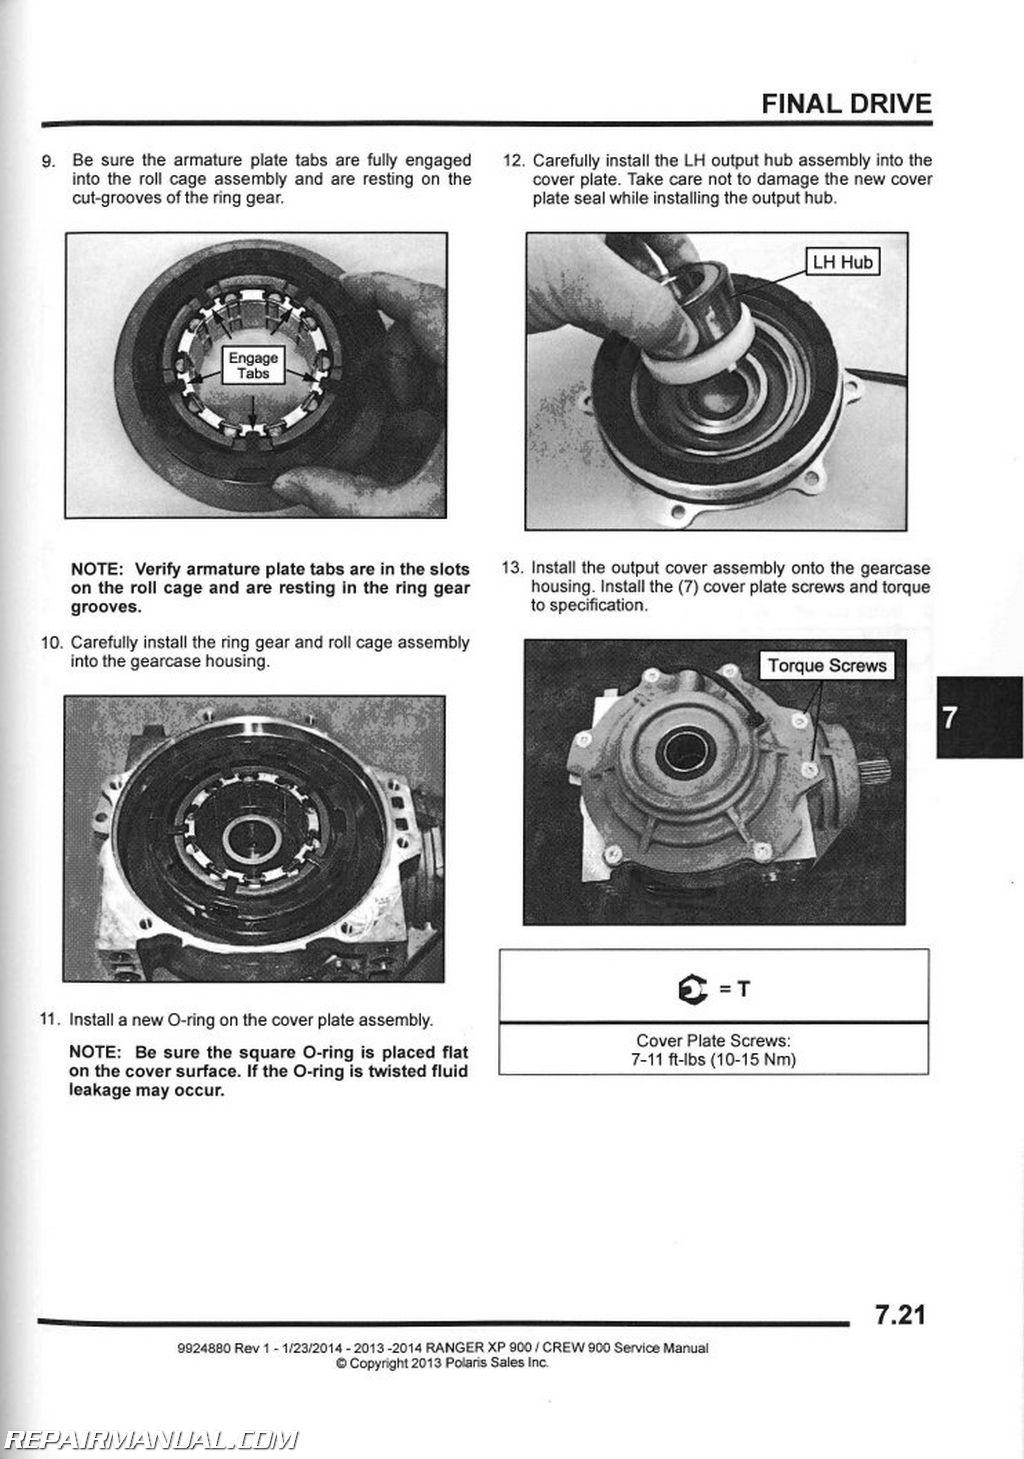 2013 polaris service manuals